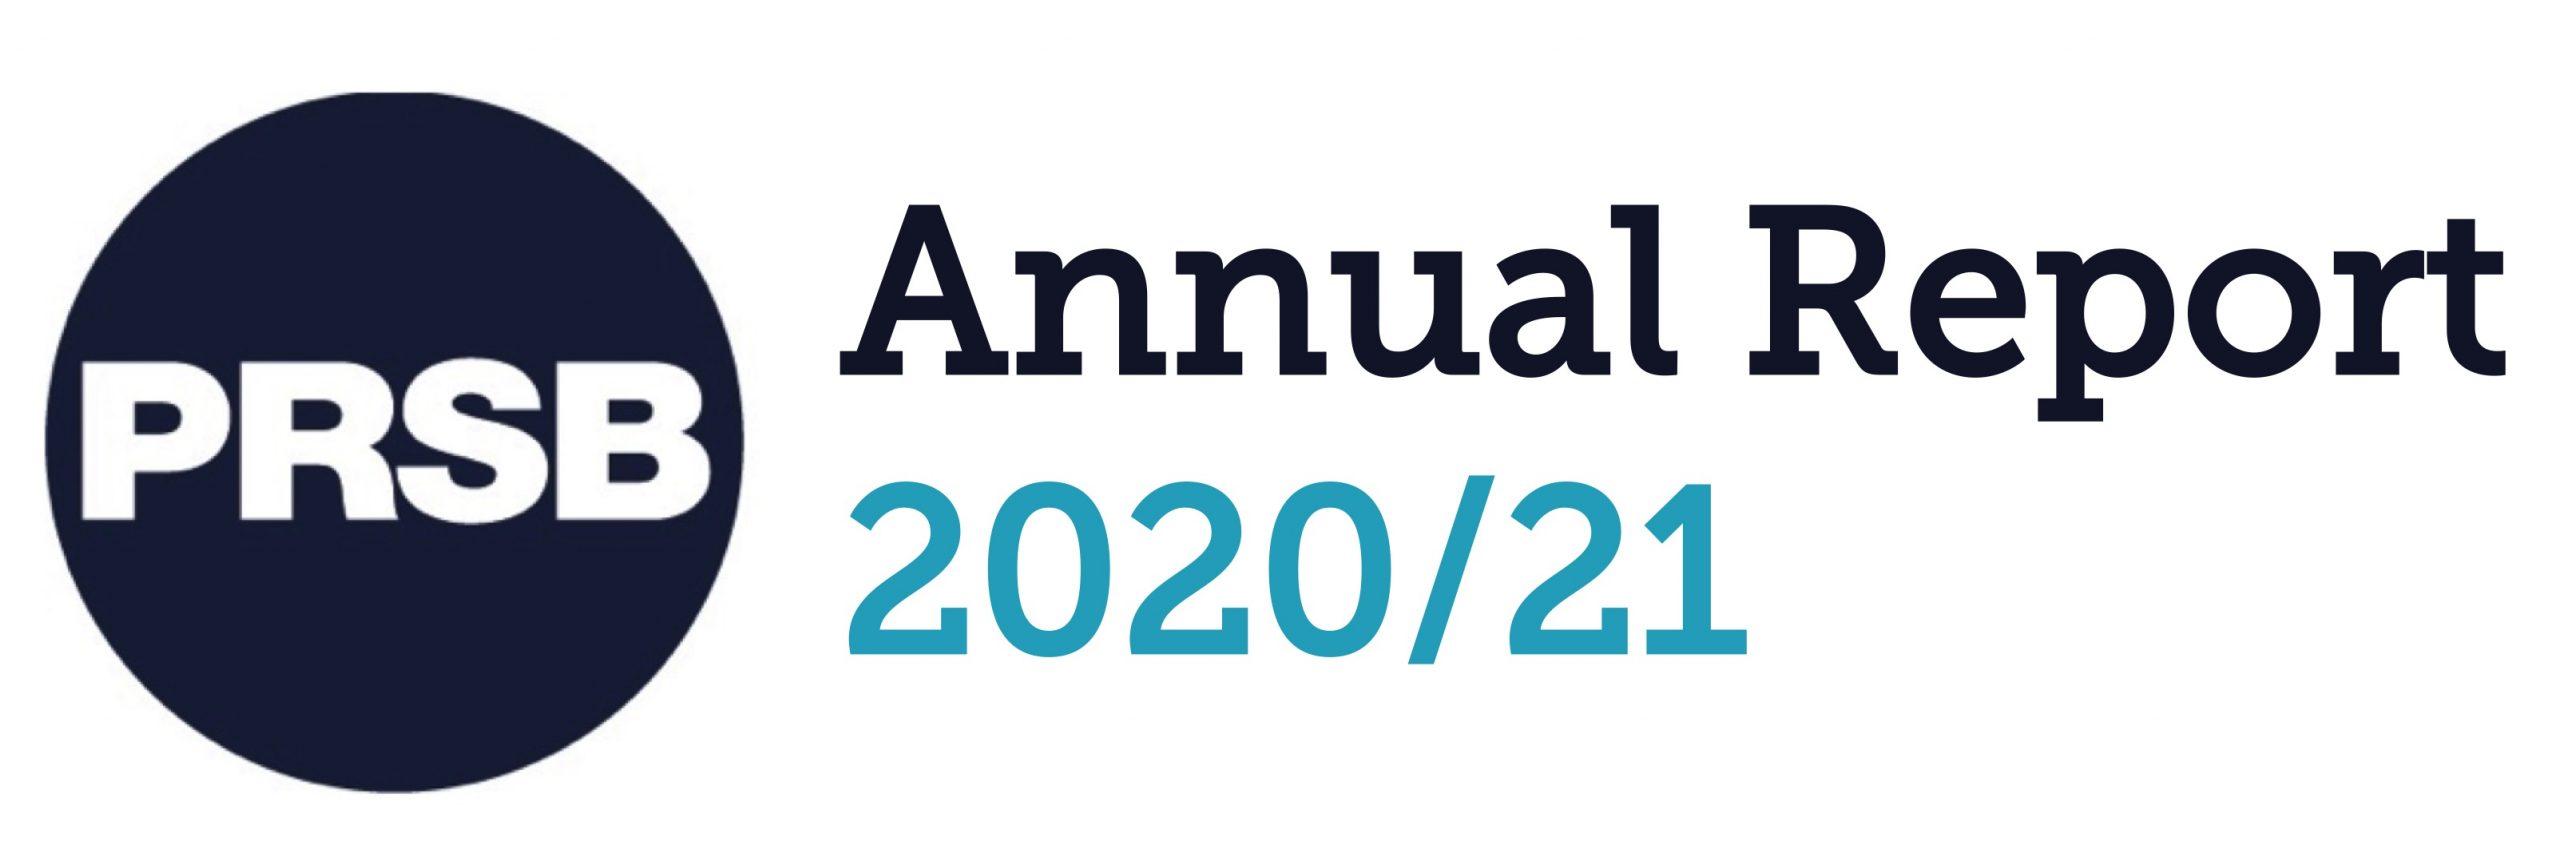 PRSB annual report 2020-21